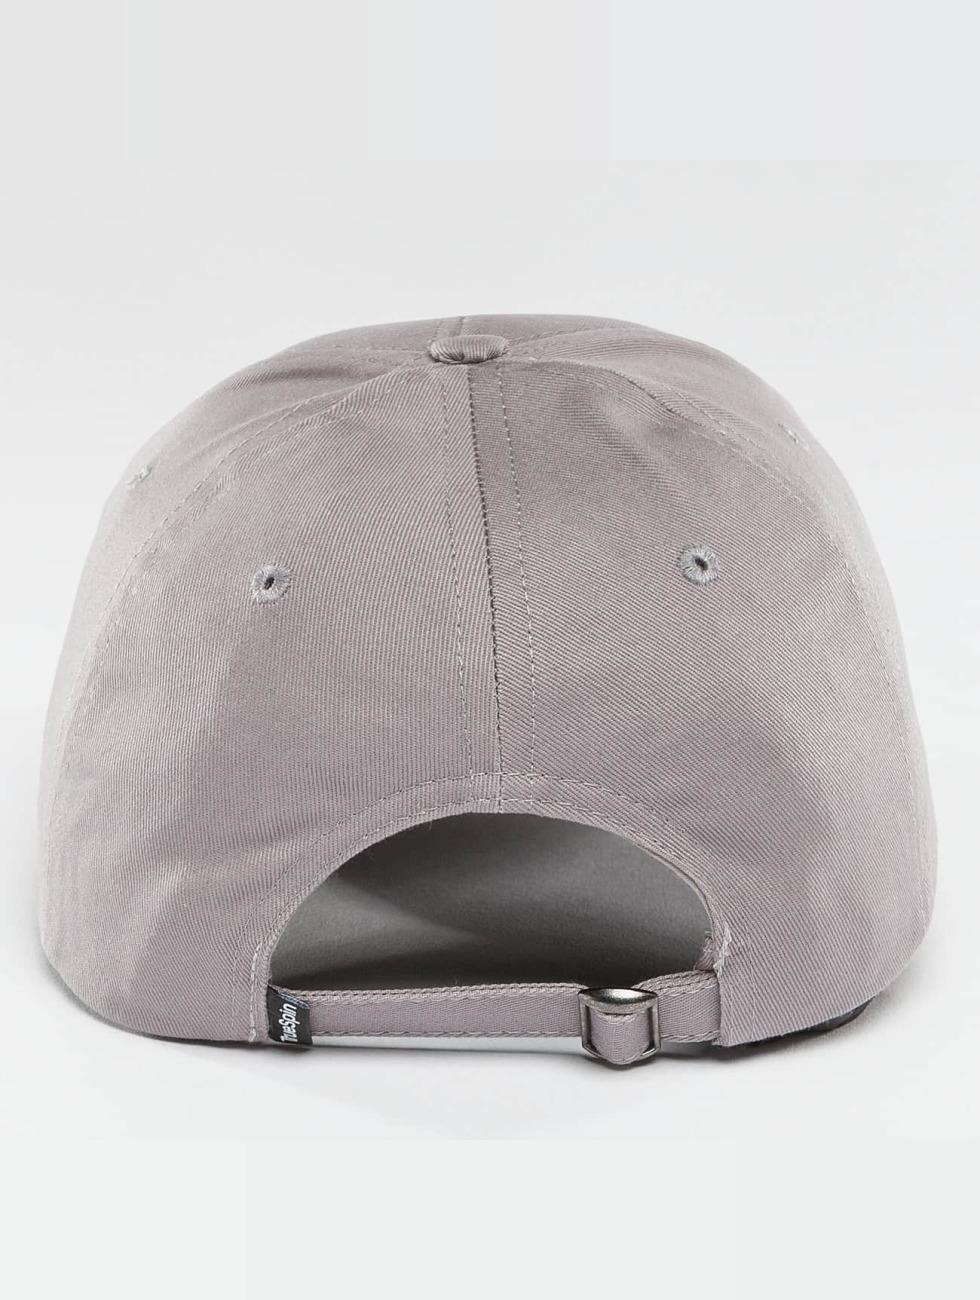 TrueSpin Casquette Snapback & Strapback Blank gris